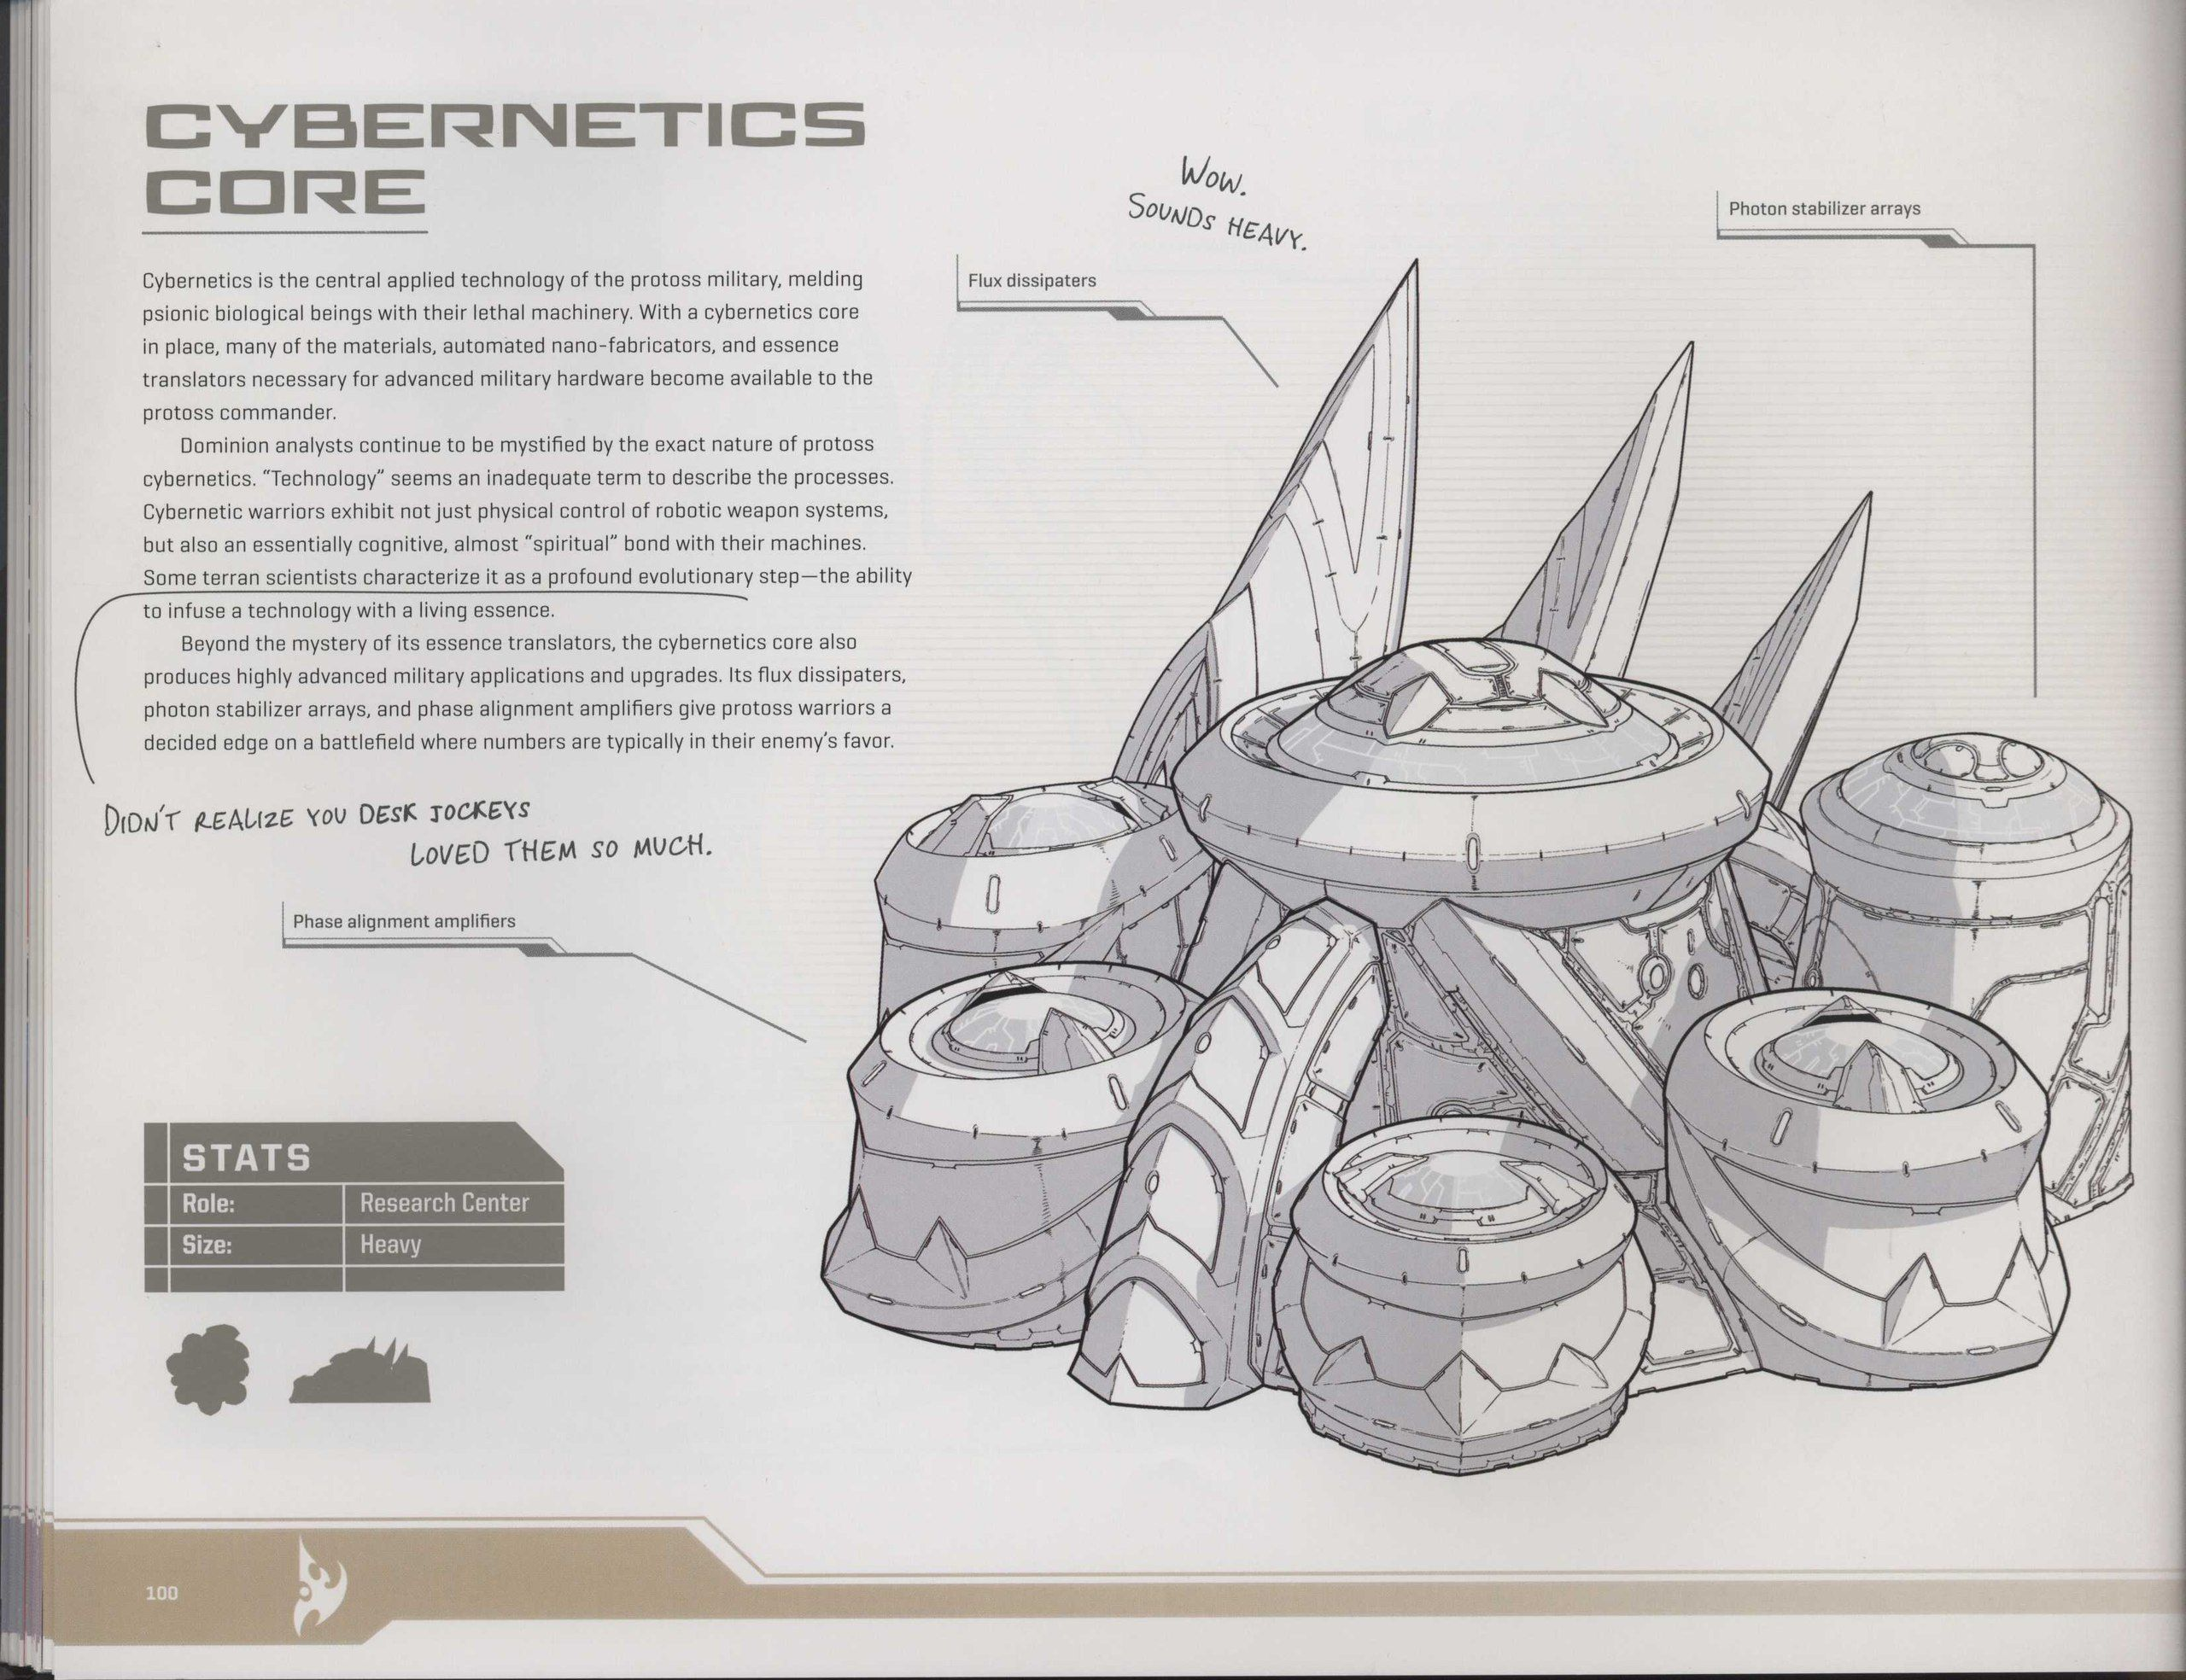 StarCraft Field Manual – 177 photos | VK | starcraft